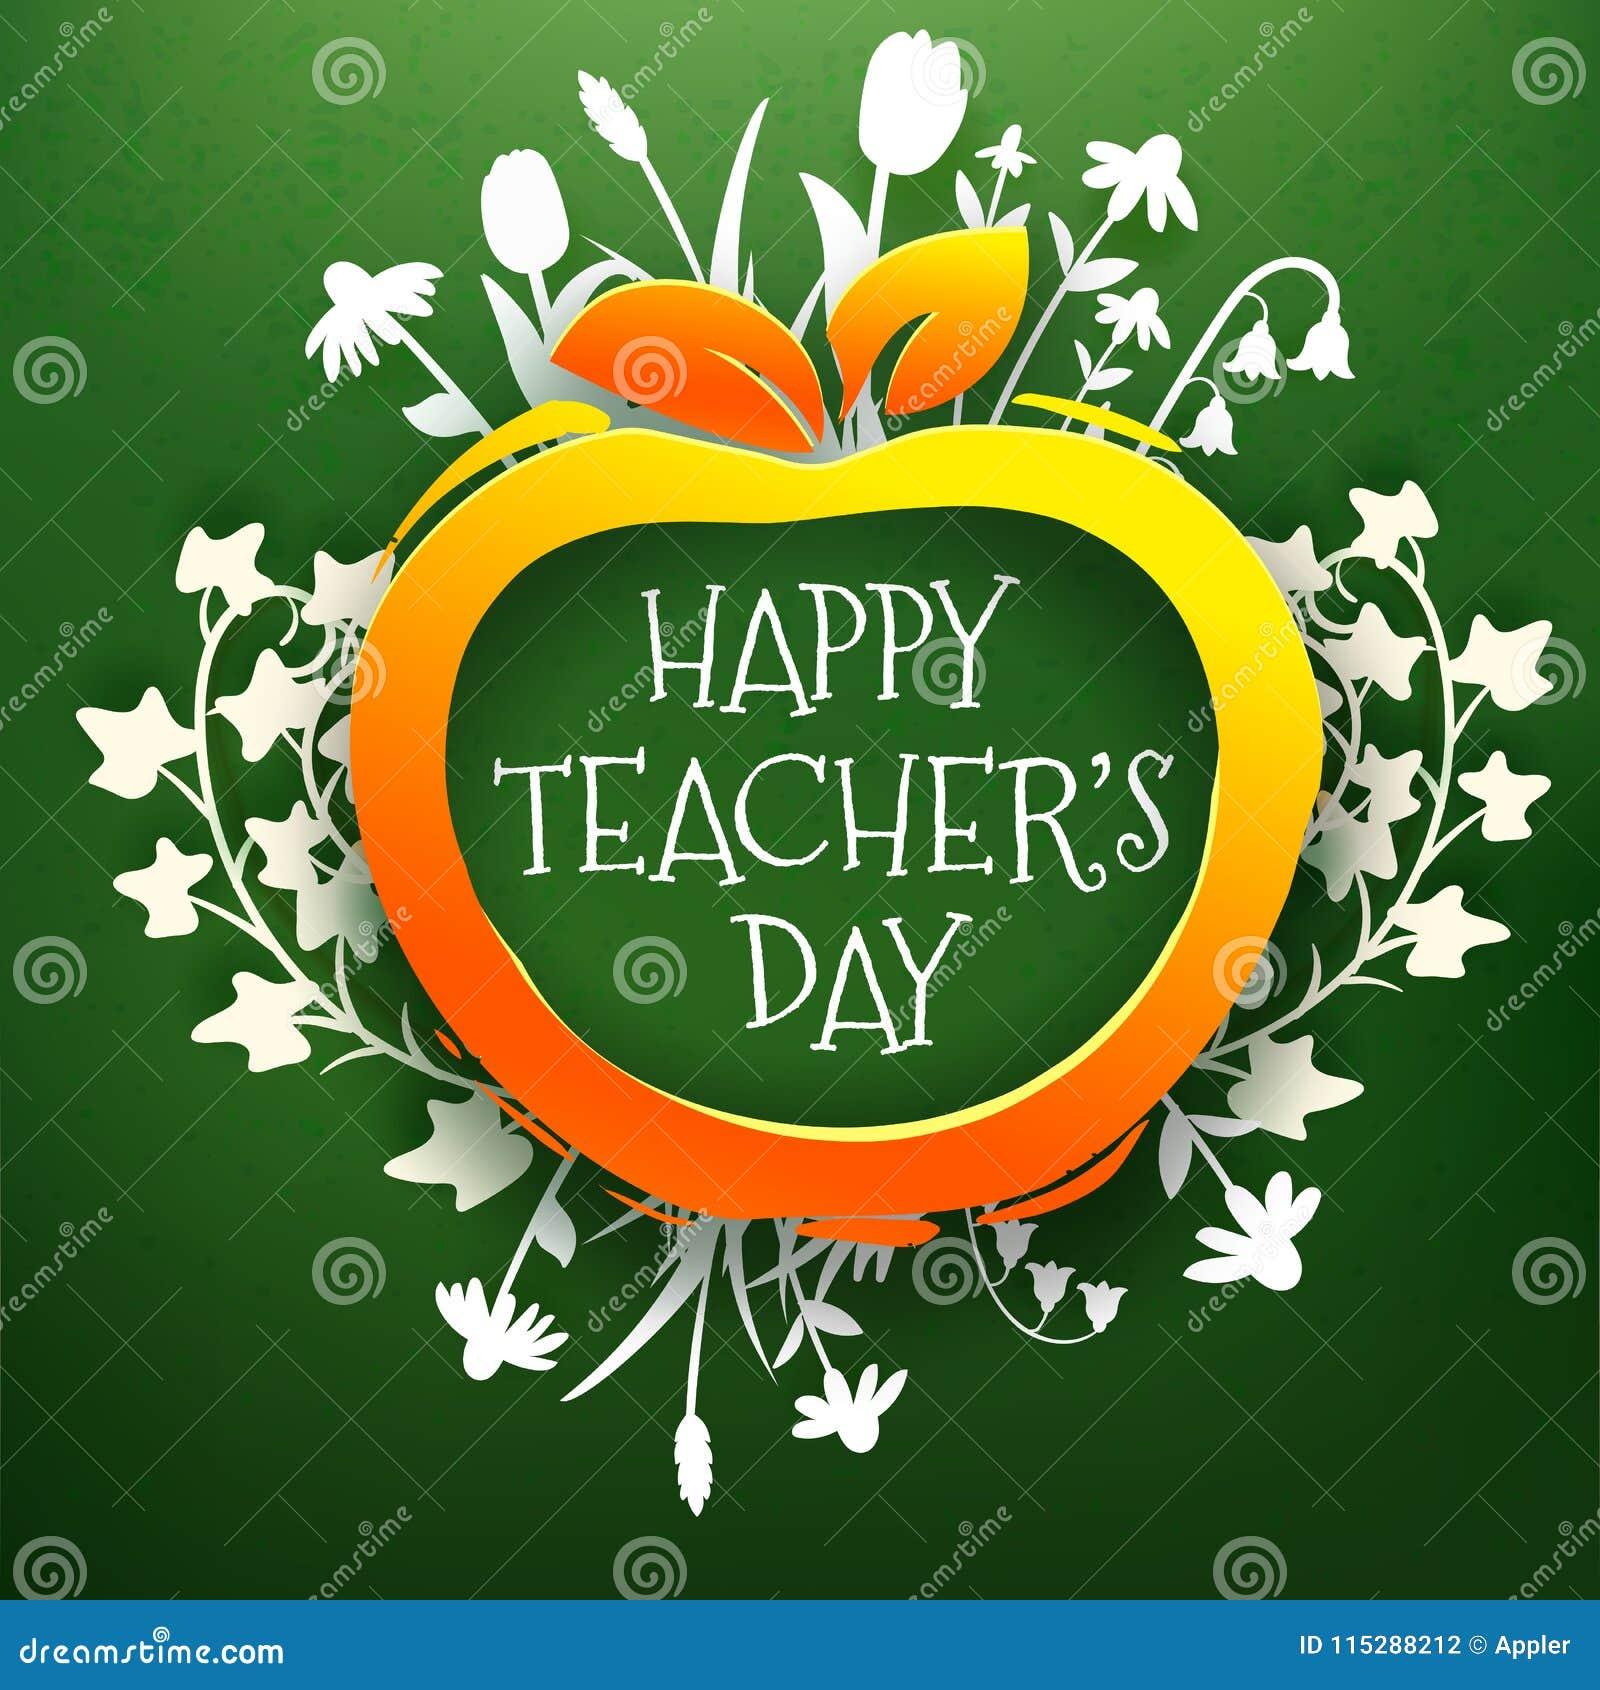 Teachers day greetings card on chalkboard stock vector teachers day greetings card on chalkboard m4hsunfo